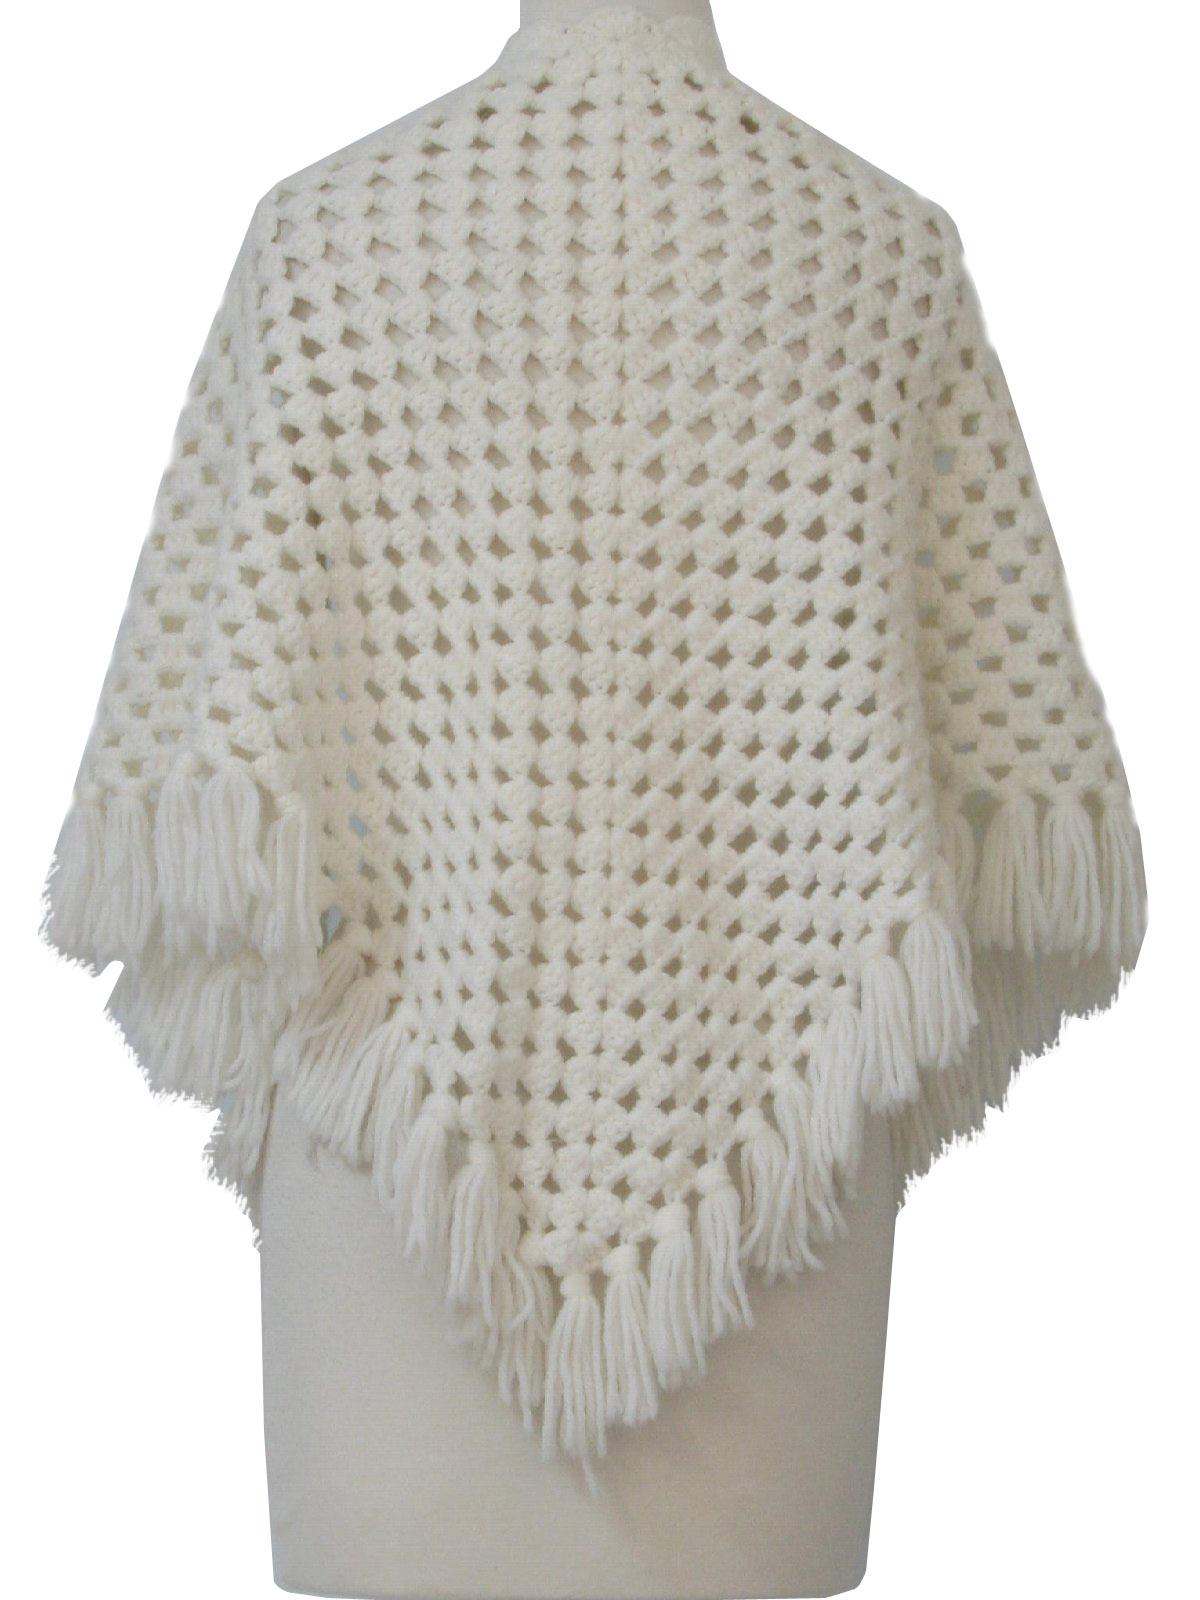 70s Sweater: 70s -no label- Womens winter white acrylic ...